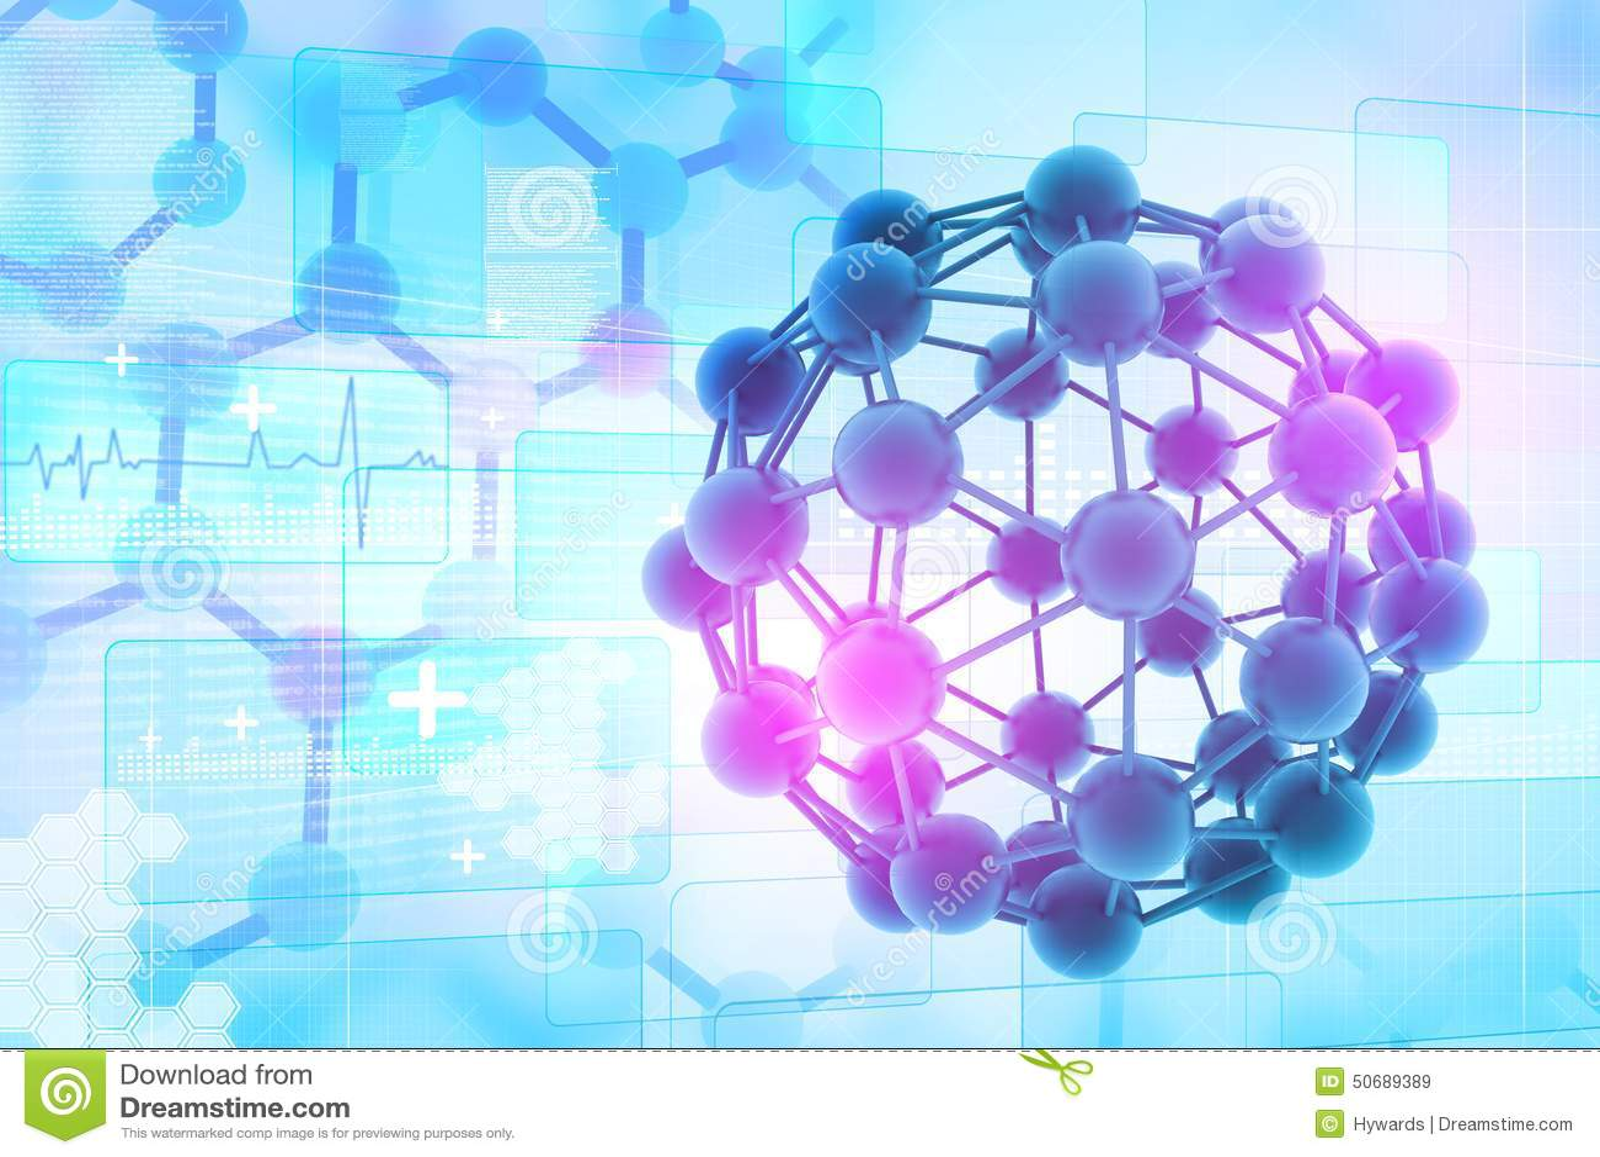 Download 分子背景 库存例证. 插画 包括有 结构, 人力, 方向, 分子, 船舶, 生活, 设计, 技术, 科学 - 50689389